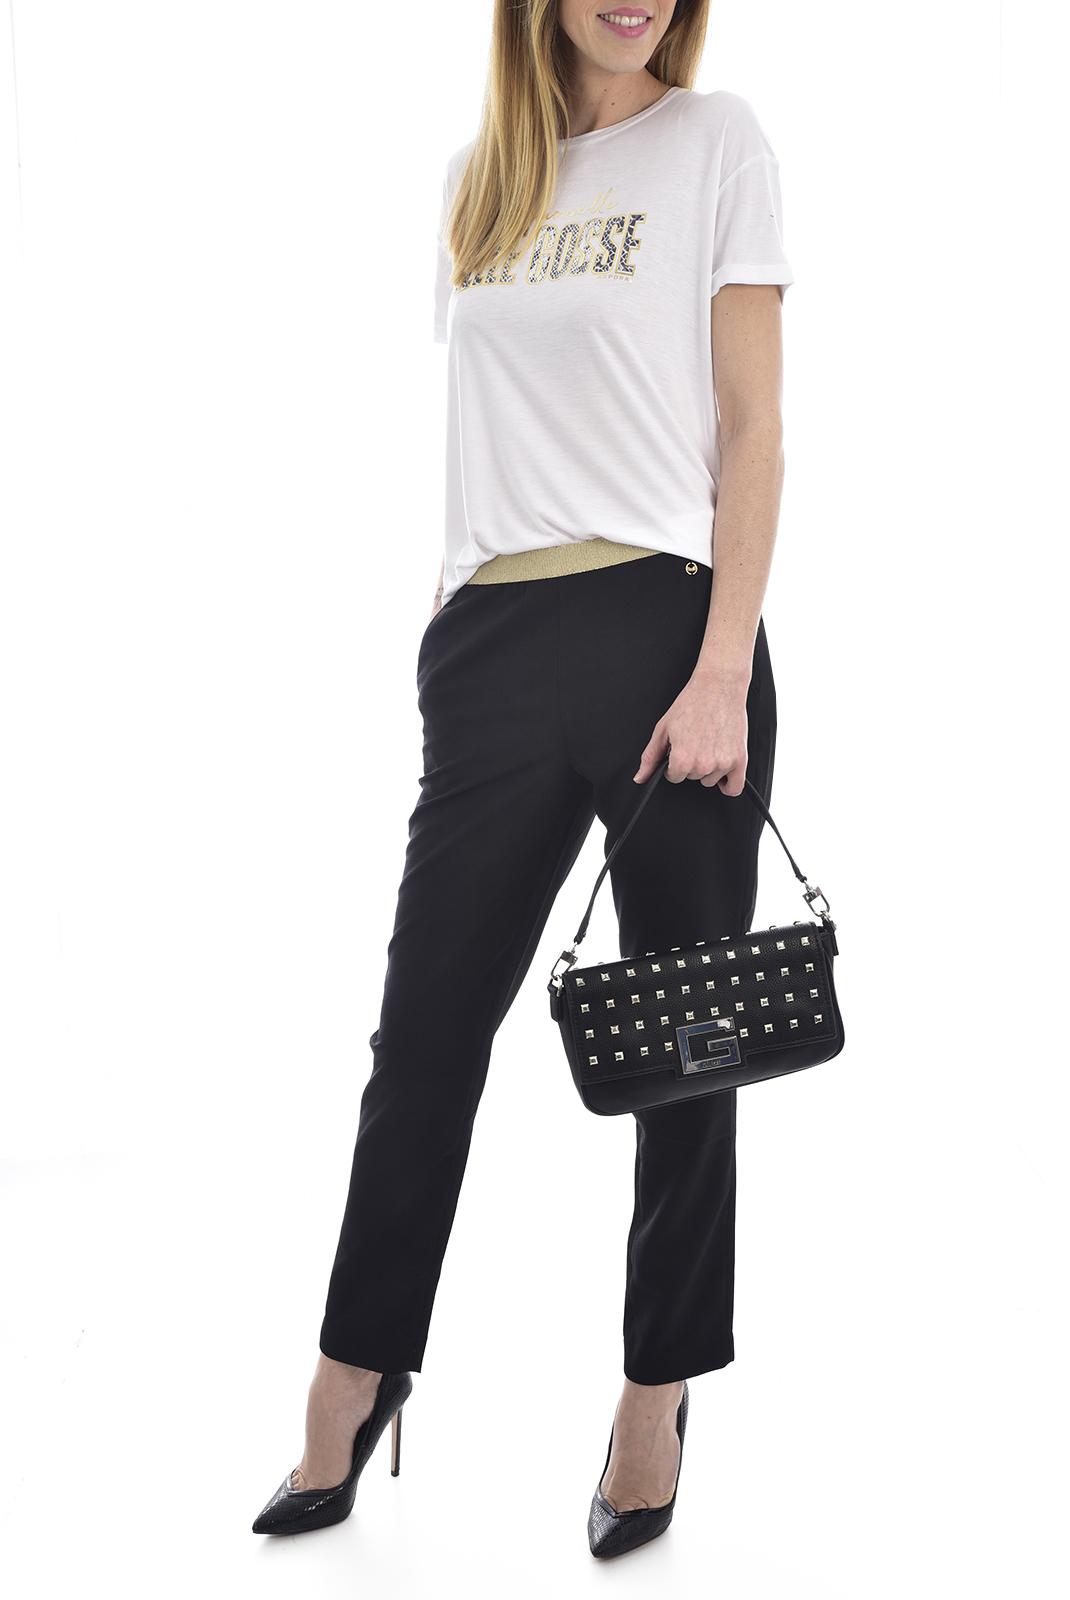 Sacs à Main  Guess jeans HWVS75 80190 brightside BLACK